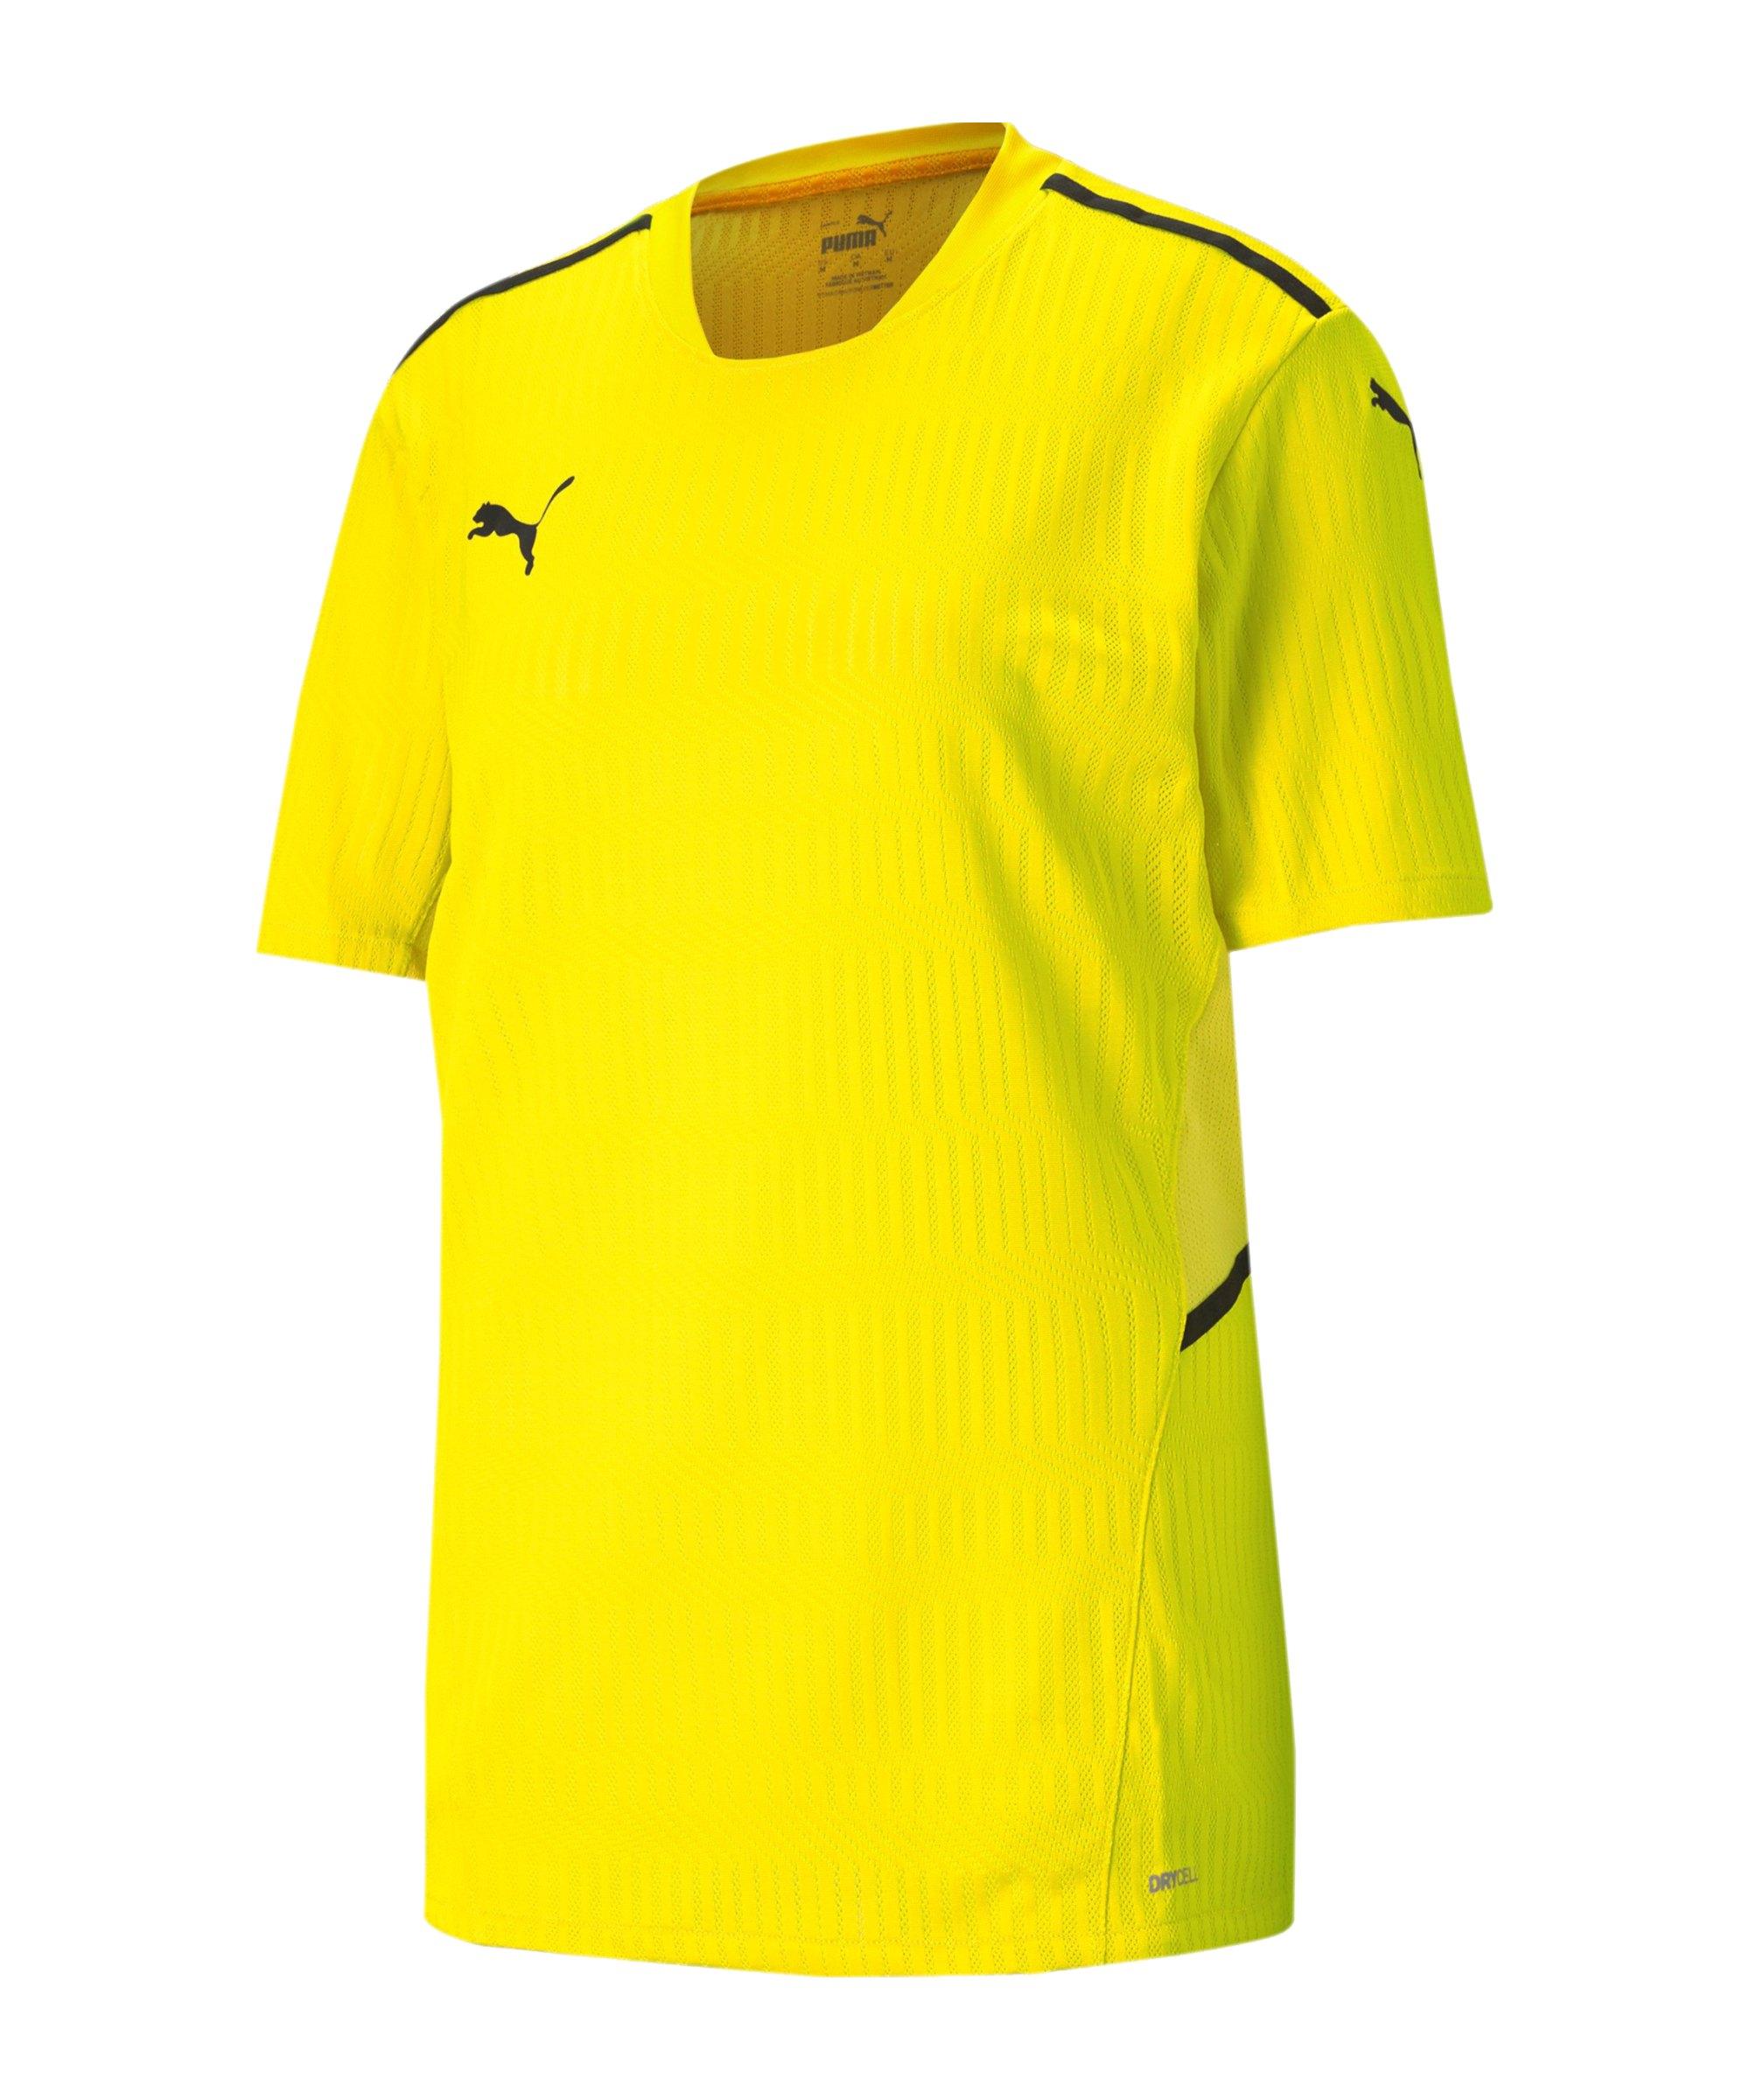 PUMA teamCUP Trikot Gelb F07 - gelb